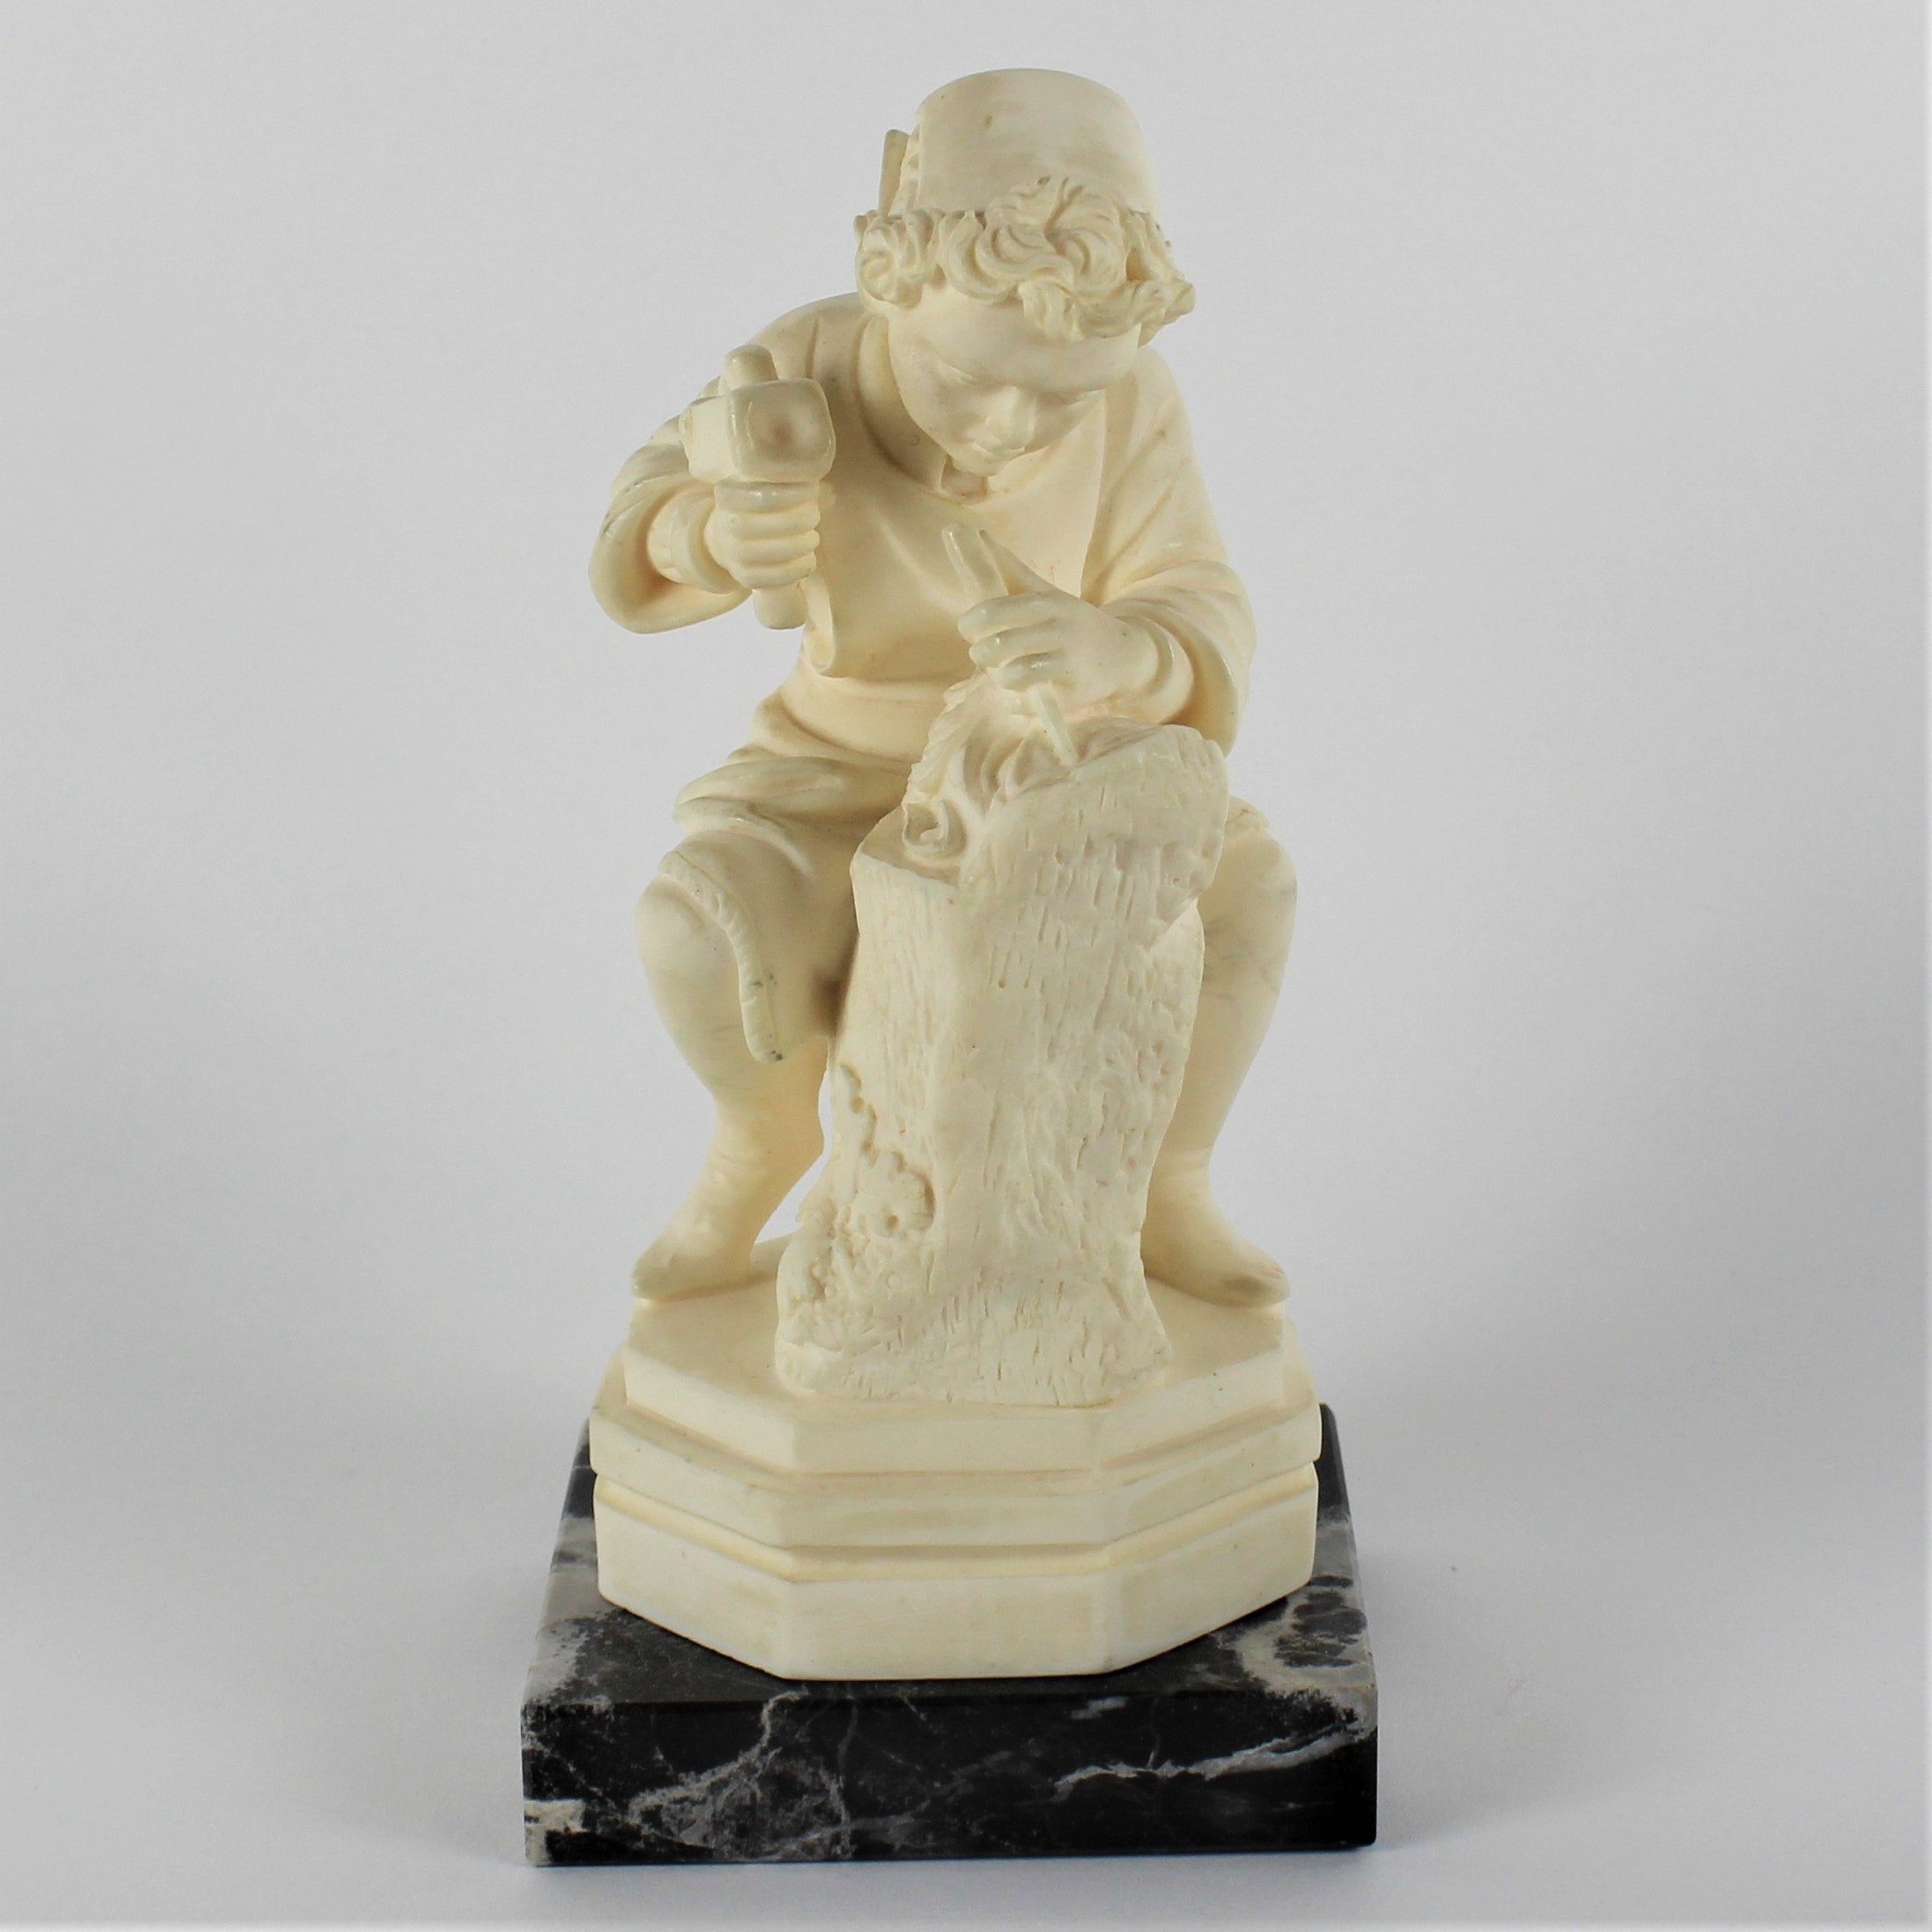 G. Ruggeri Sculpture